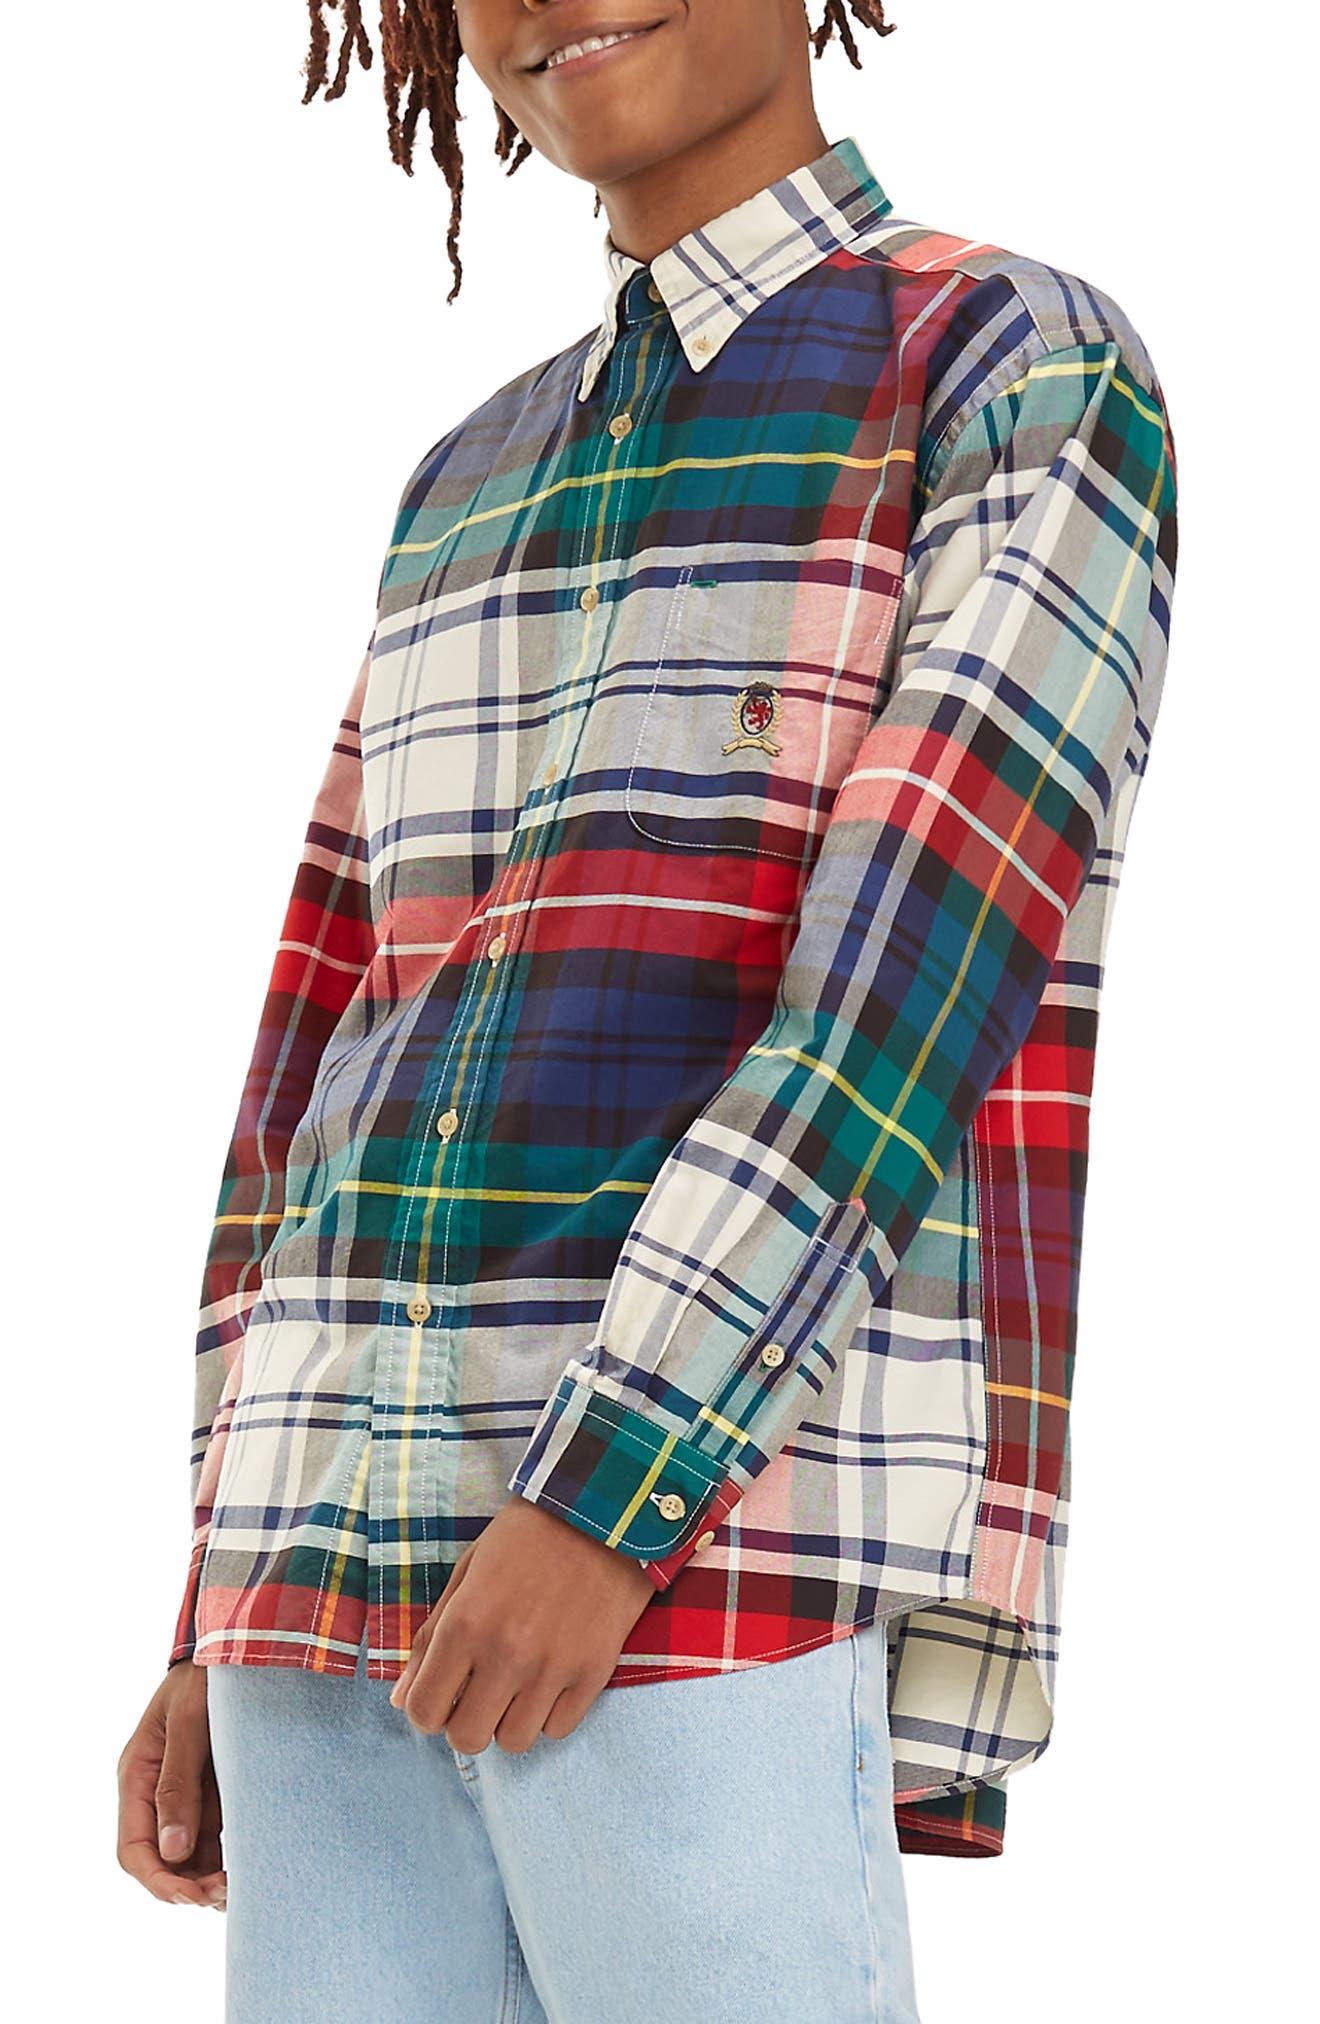 TJM Plaid Crest Sport Shirt,                             Alternate thumbnail 4, color,                             CHECK DARK SAPPHIRE / MULTI